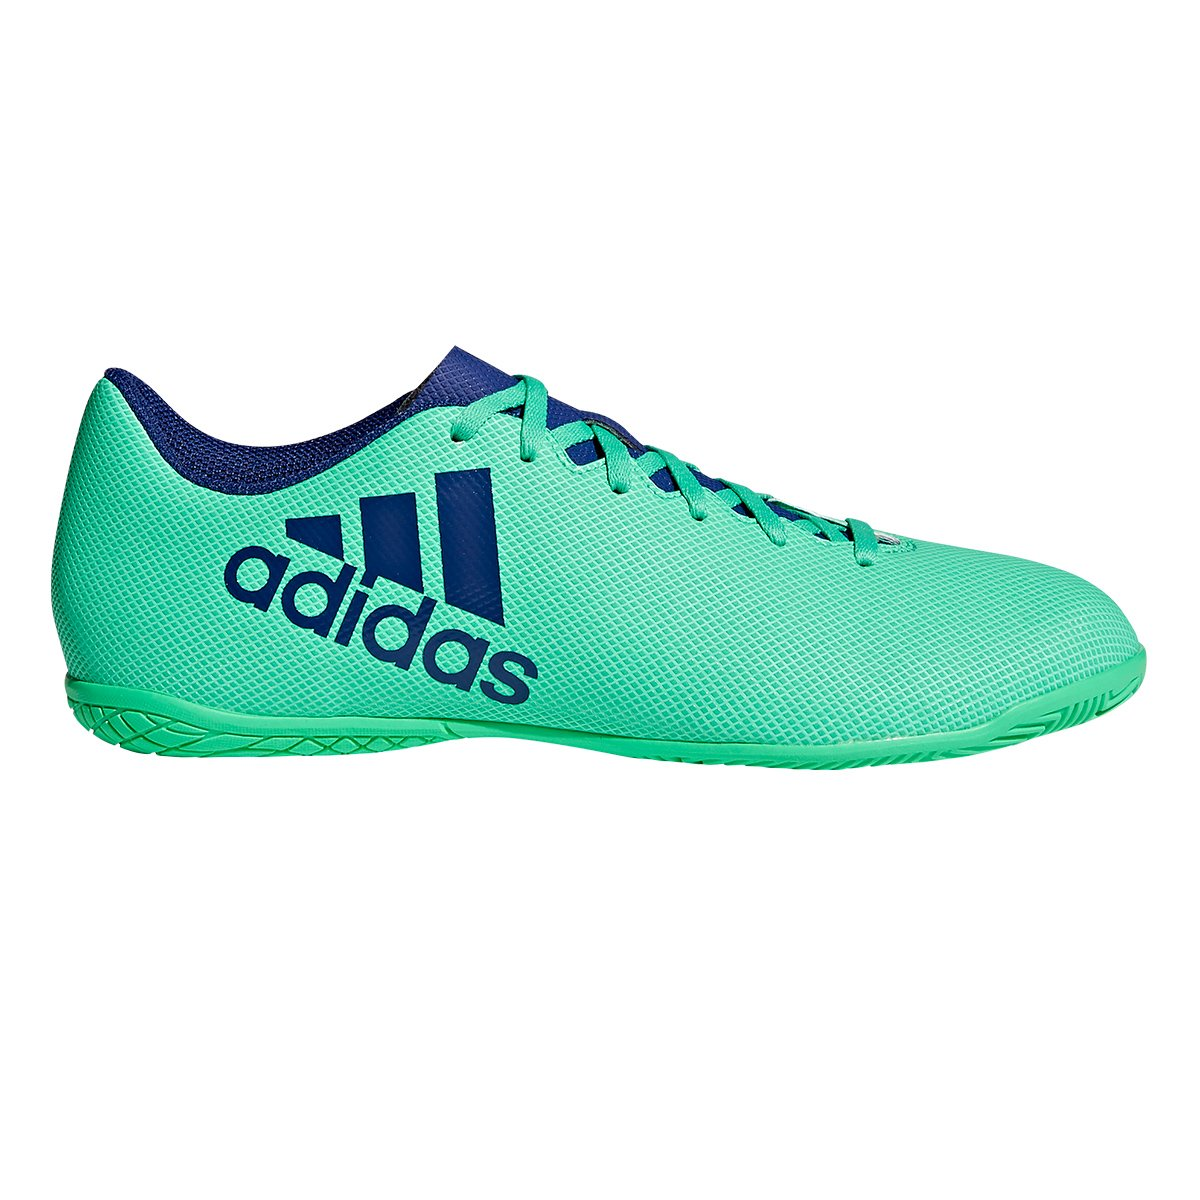 54efd38eaf Chuteira Futsal Adidas X 17.4 IN - Verde e Azul